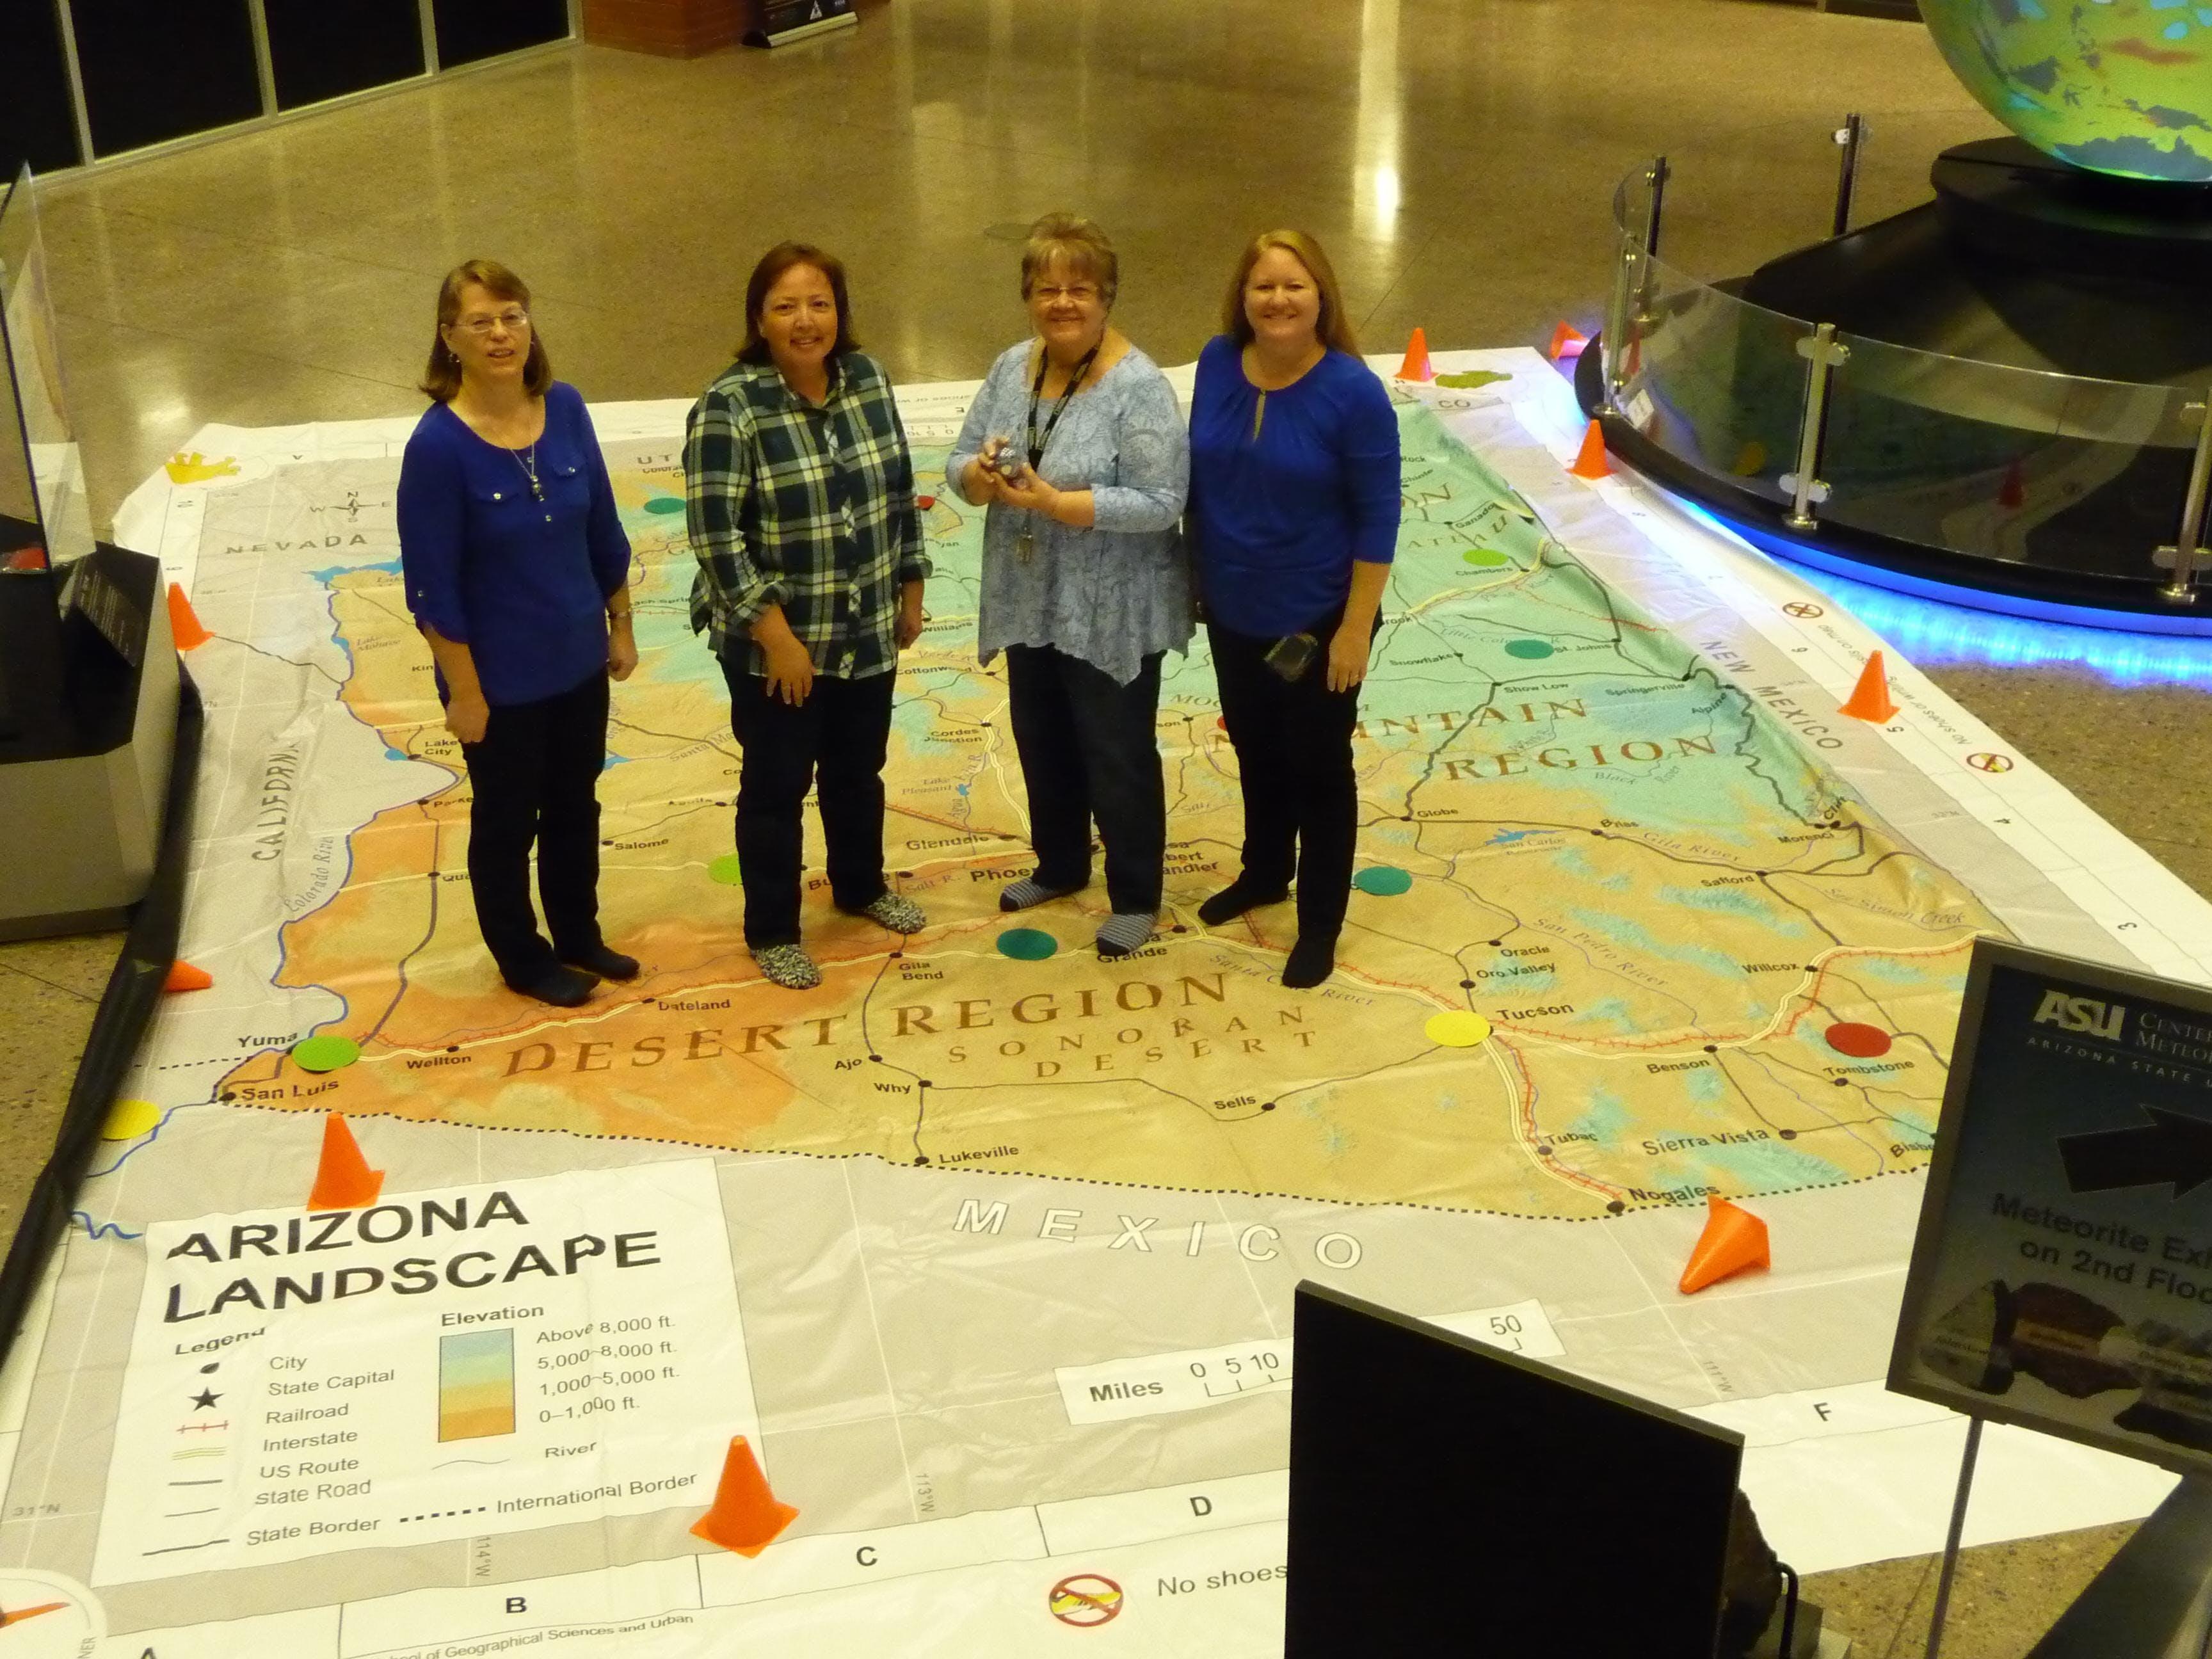 Arizona State University Tempe Campus Map.Using The Giant Arizona Floor Map Tempe Tempe